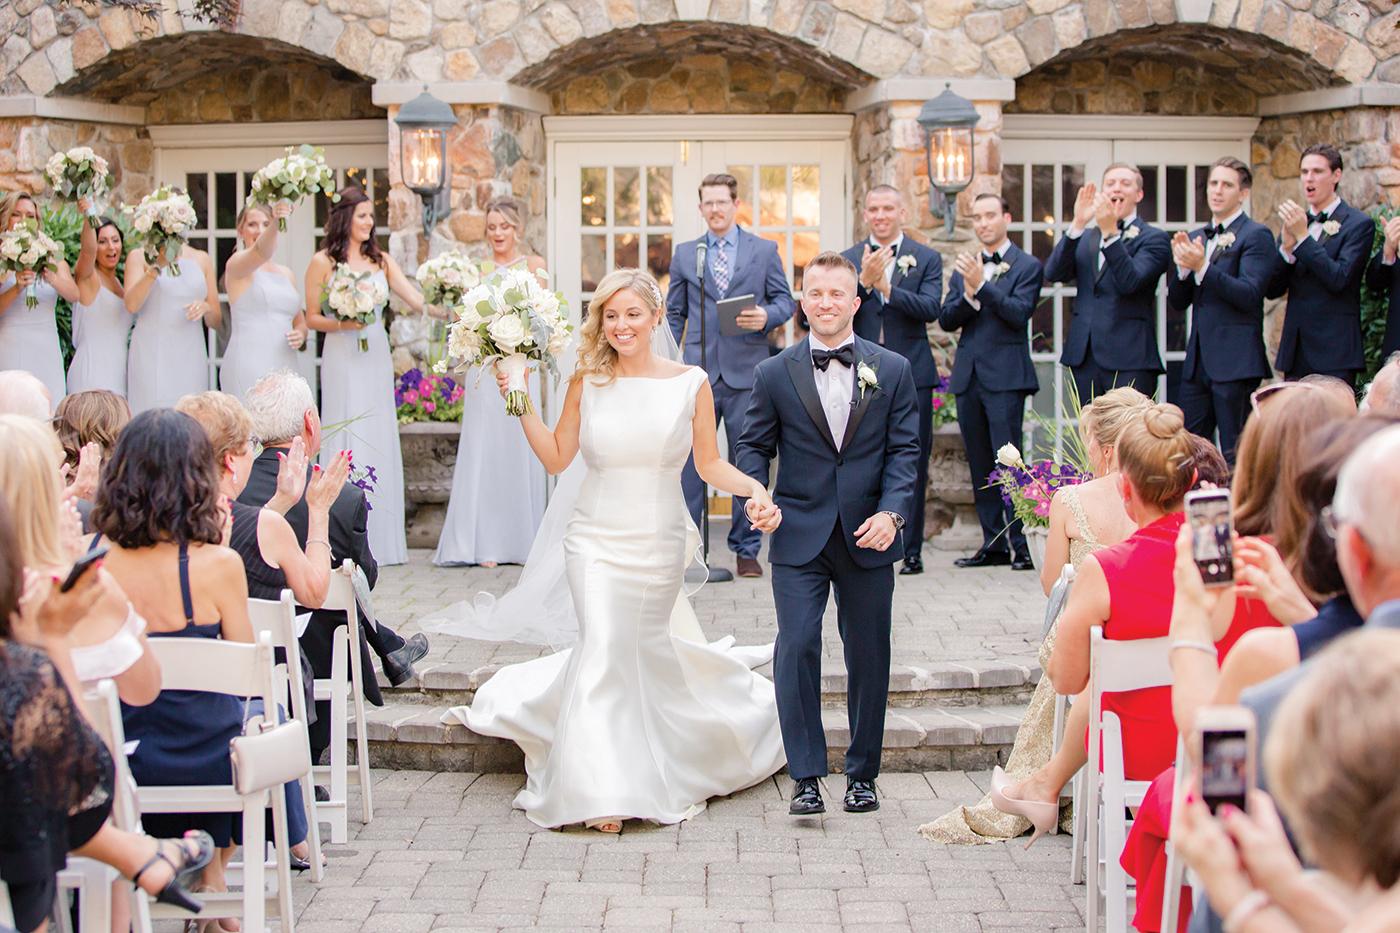 Jamie & Matt's Wedding at The Olde Mill Inn